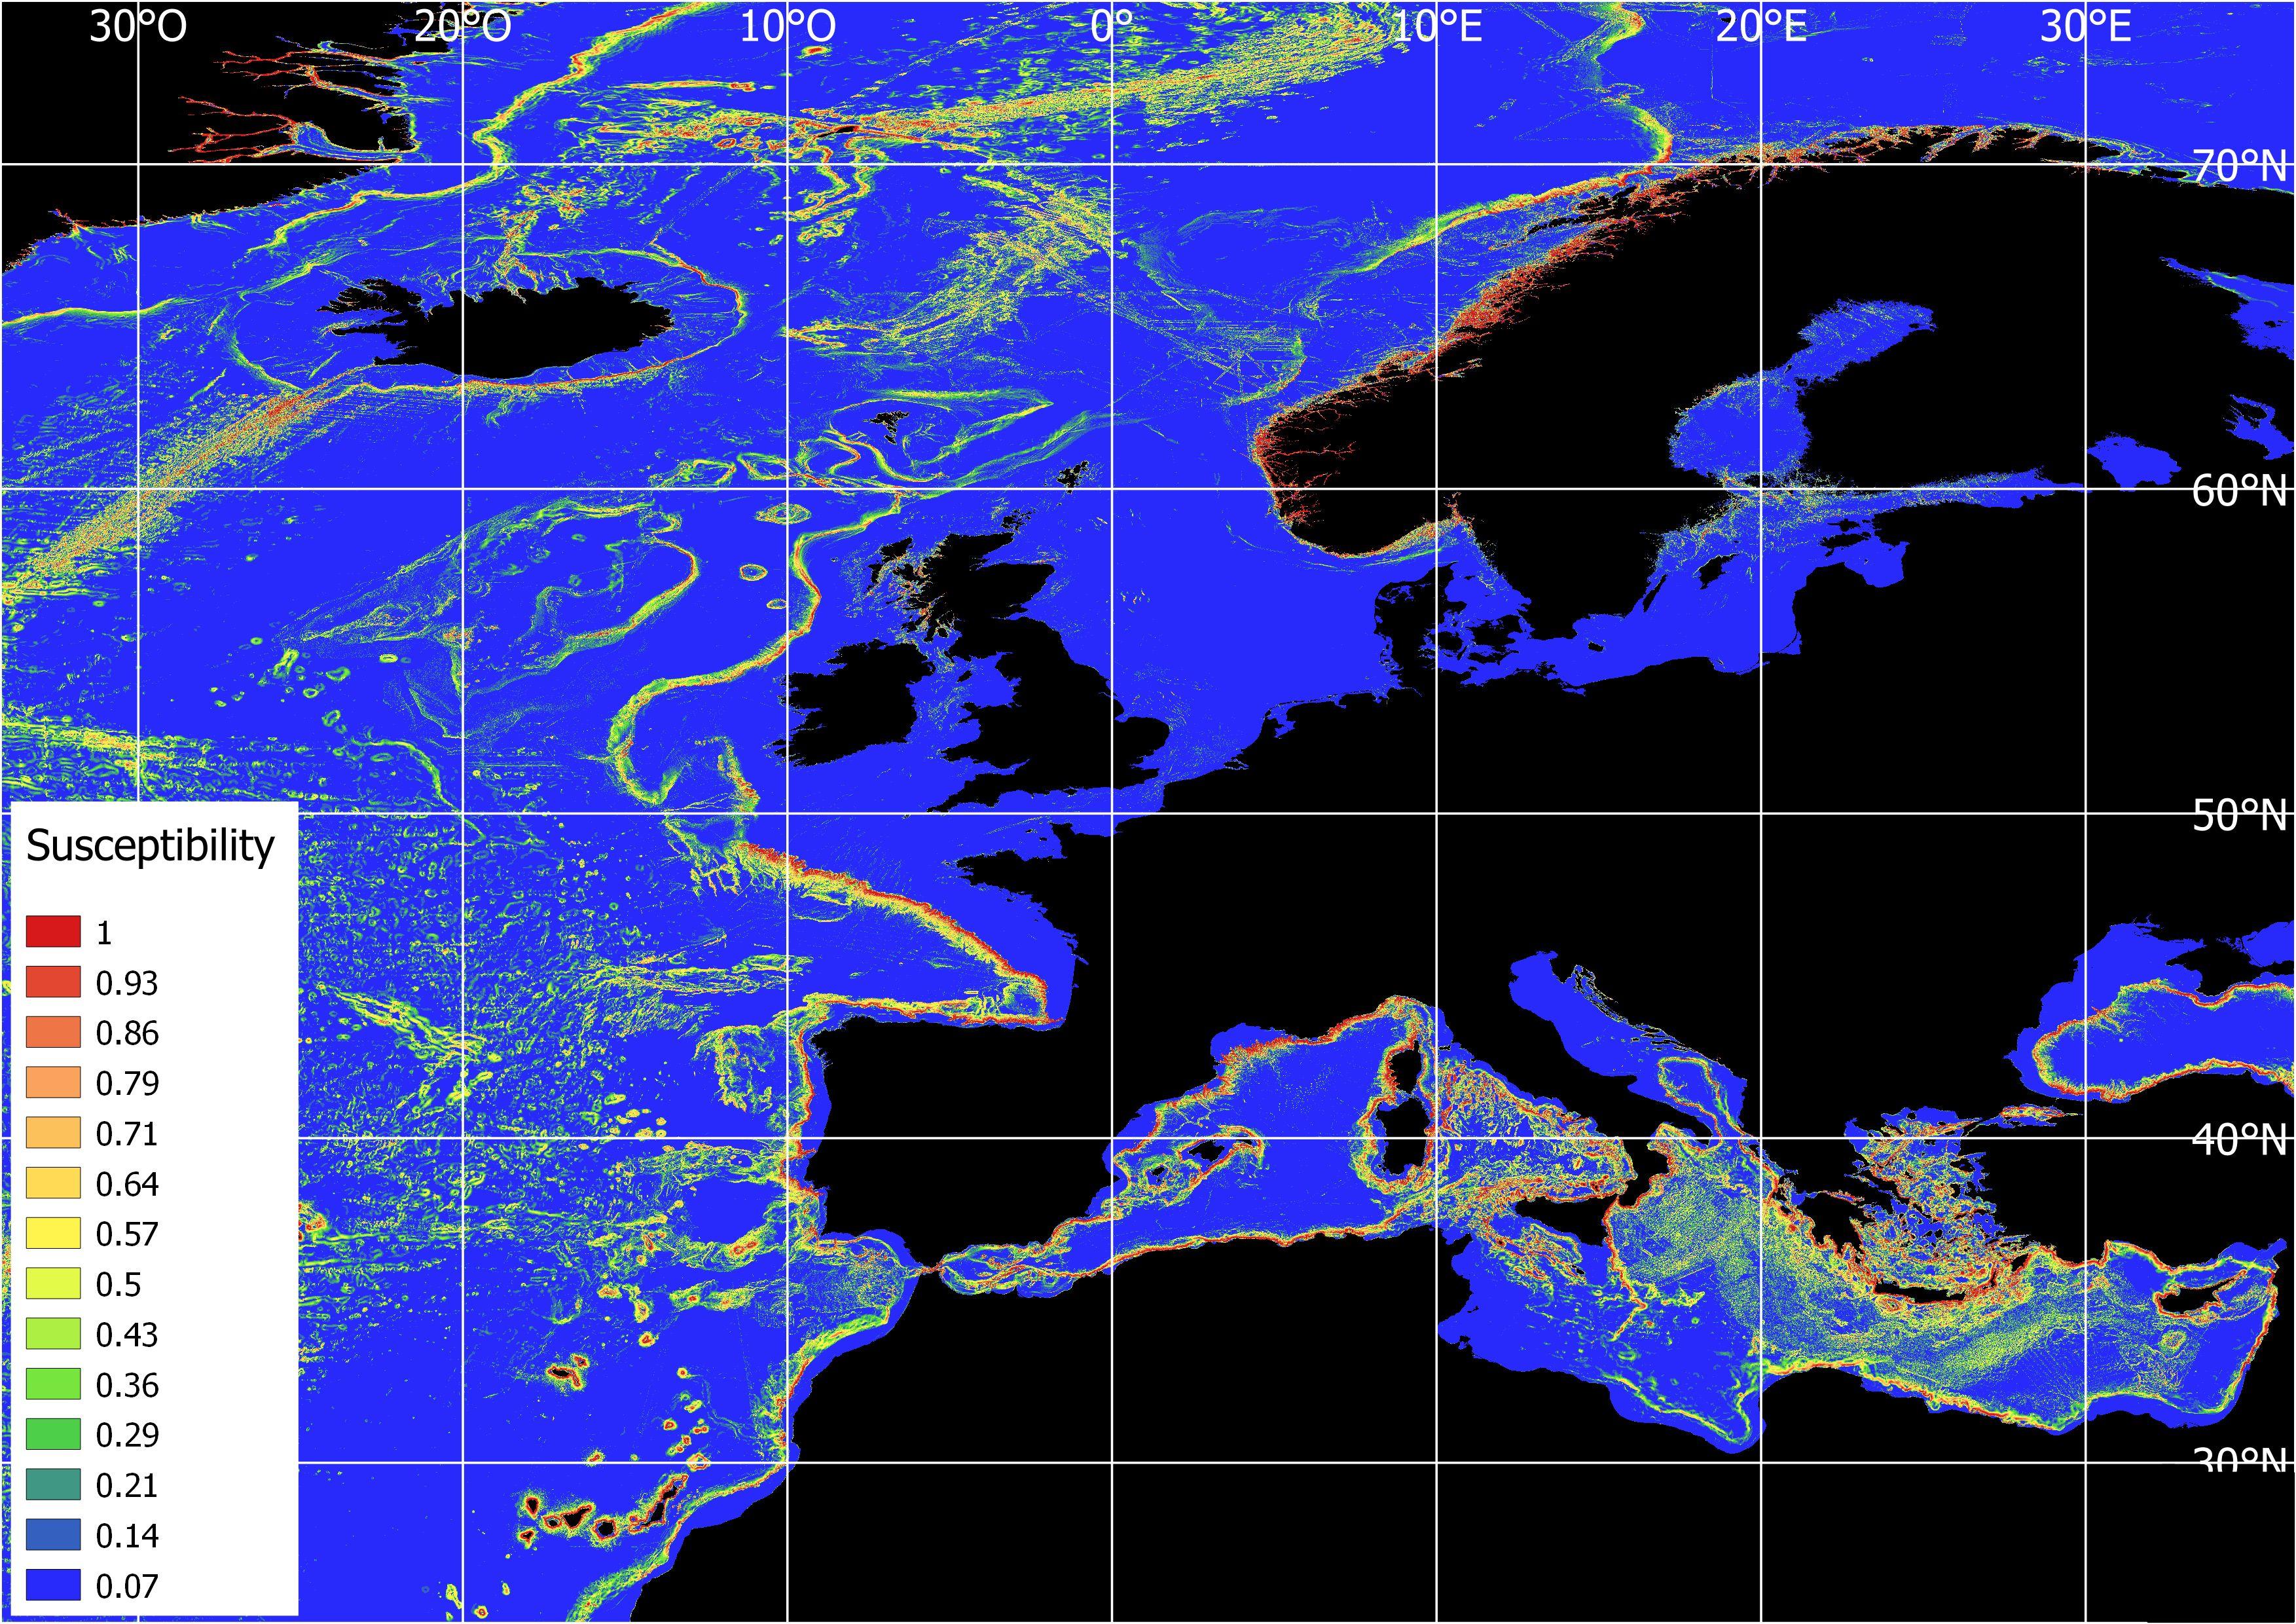 Submarine landslides susceptibility map